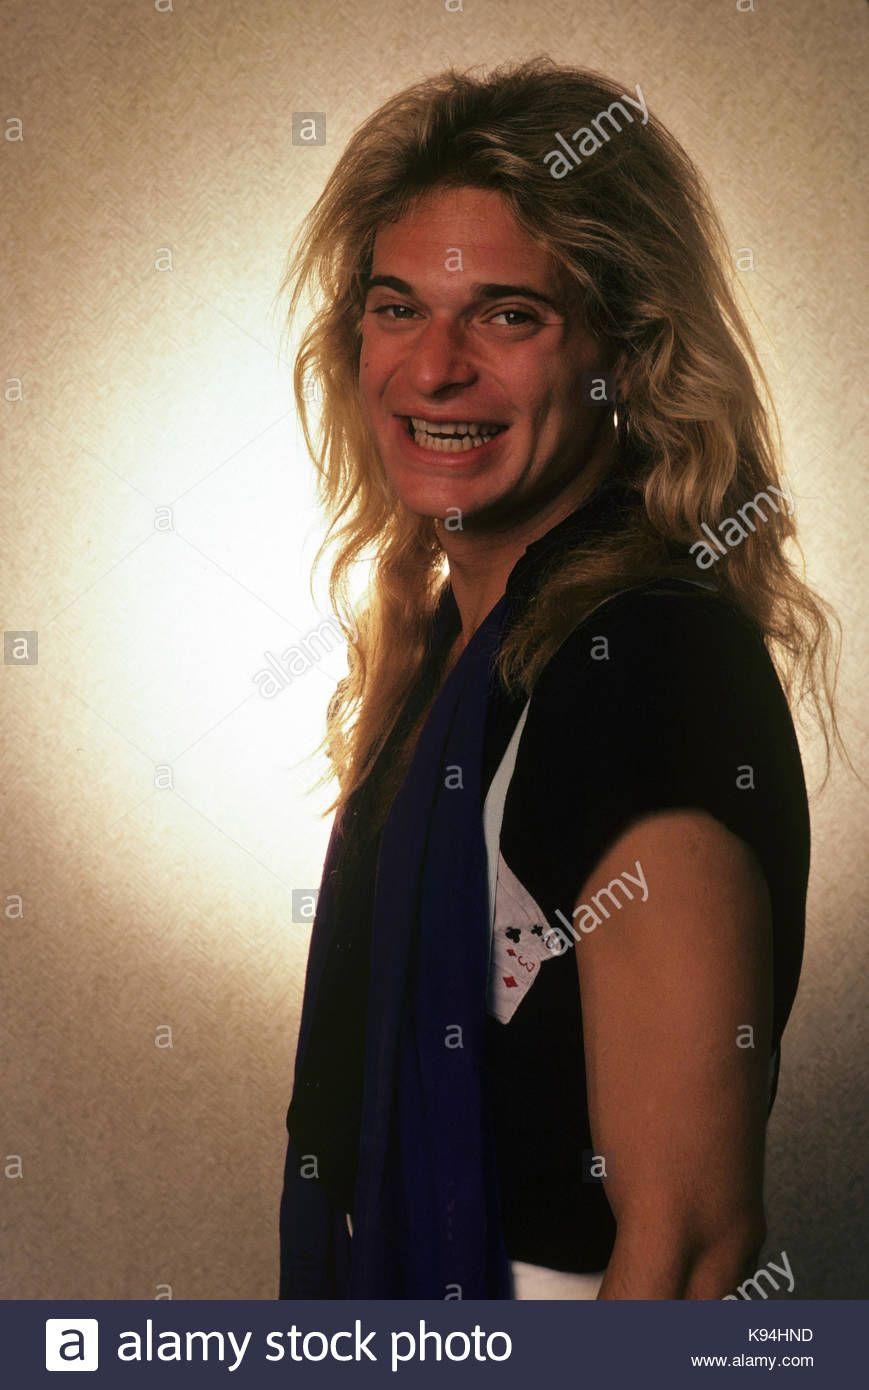 Alex Van Halen Eddie Van Halen Eddie Van Halen Van Halen Alex Van Halen